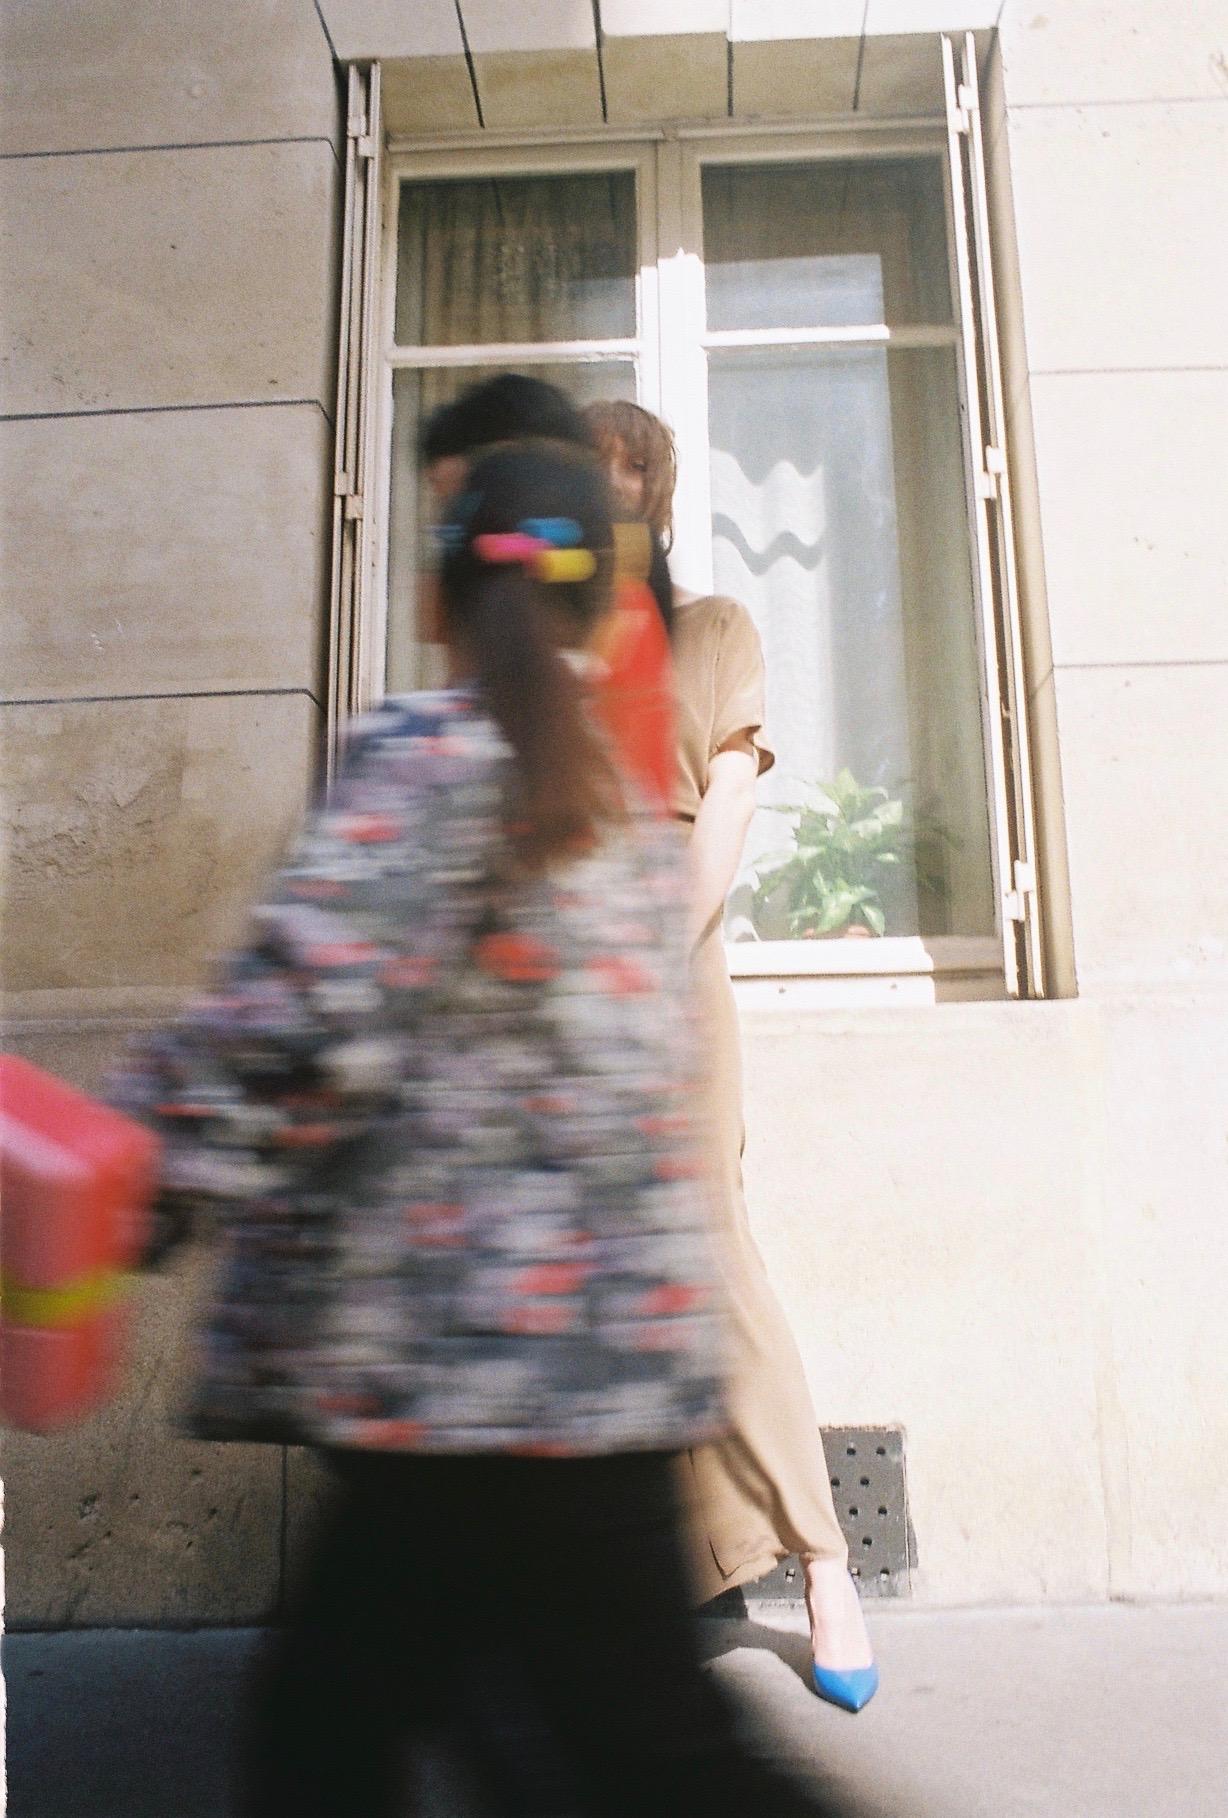 dress  MAISON DORIS , boots  REPETTO , bag  NINA RICCI  VINTAGE